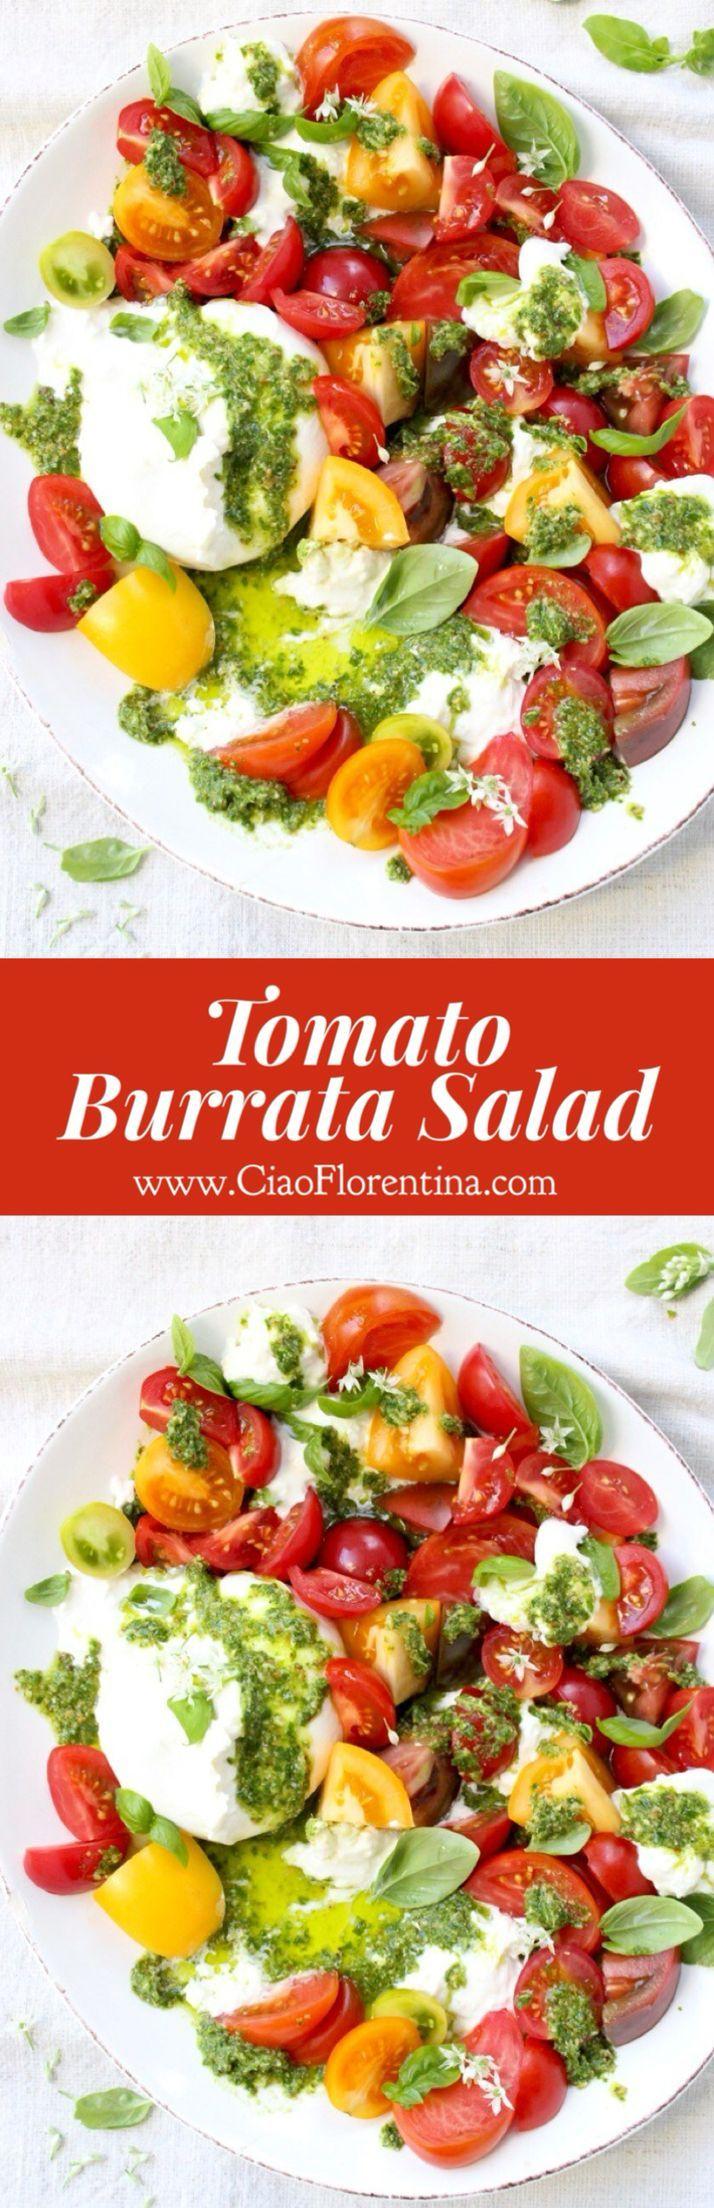 Tomato Burrata Salad Recipe,  Burrata Caprese with Heirloom Tomatoes and Basil Pesto   CiaoFlorentina.com @CiaoFlorentina